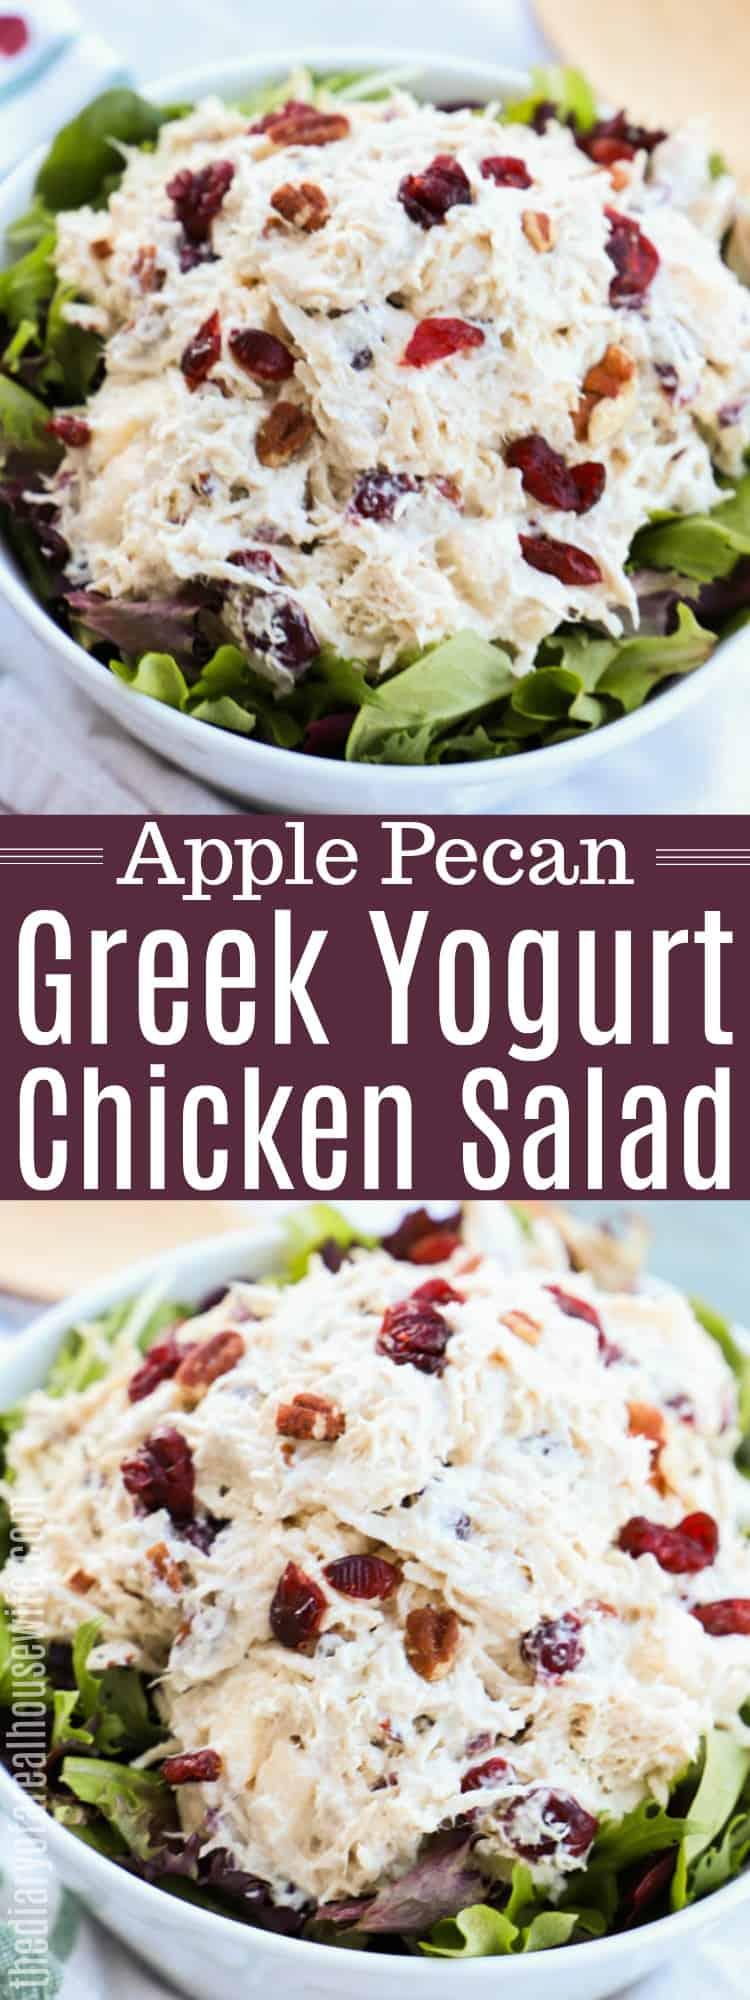 Apple Pecan Greek Yogurt Chicken Salad